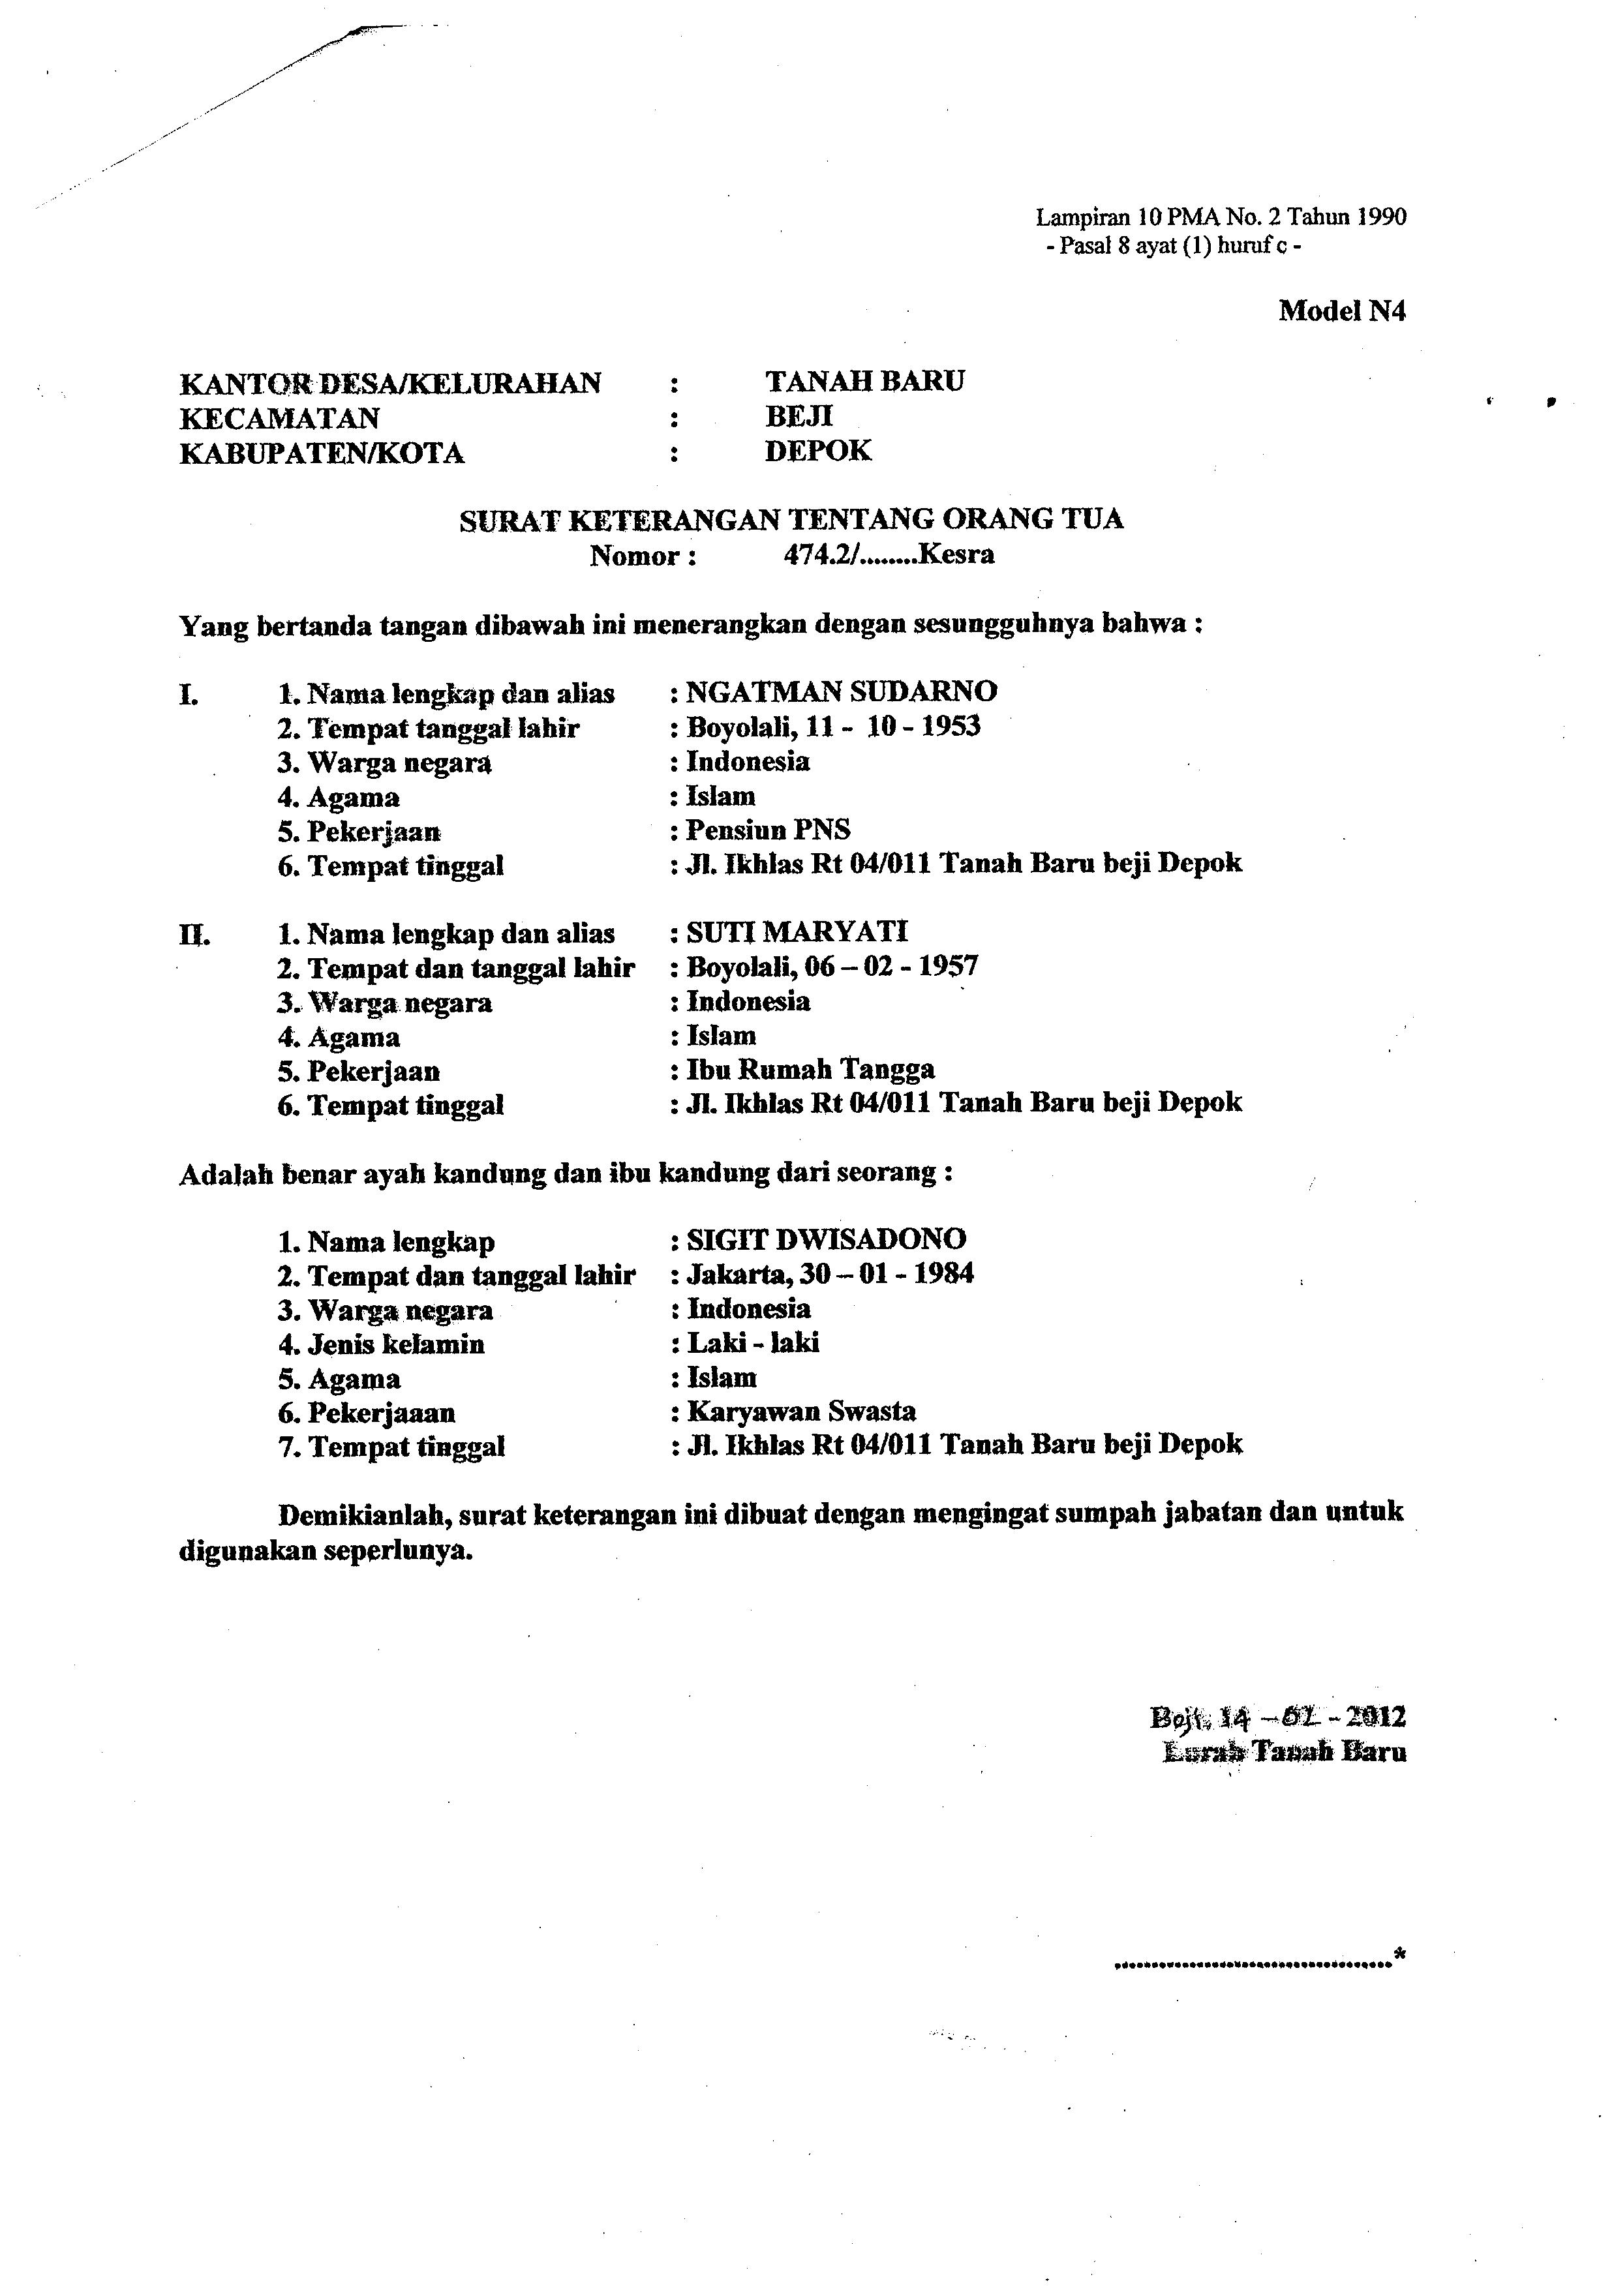 Pembuatan Surat Ijin Numpang Menikah Dwisadono Sigit